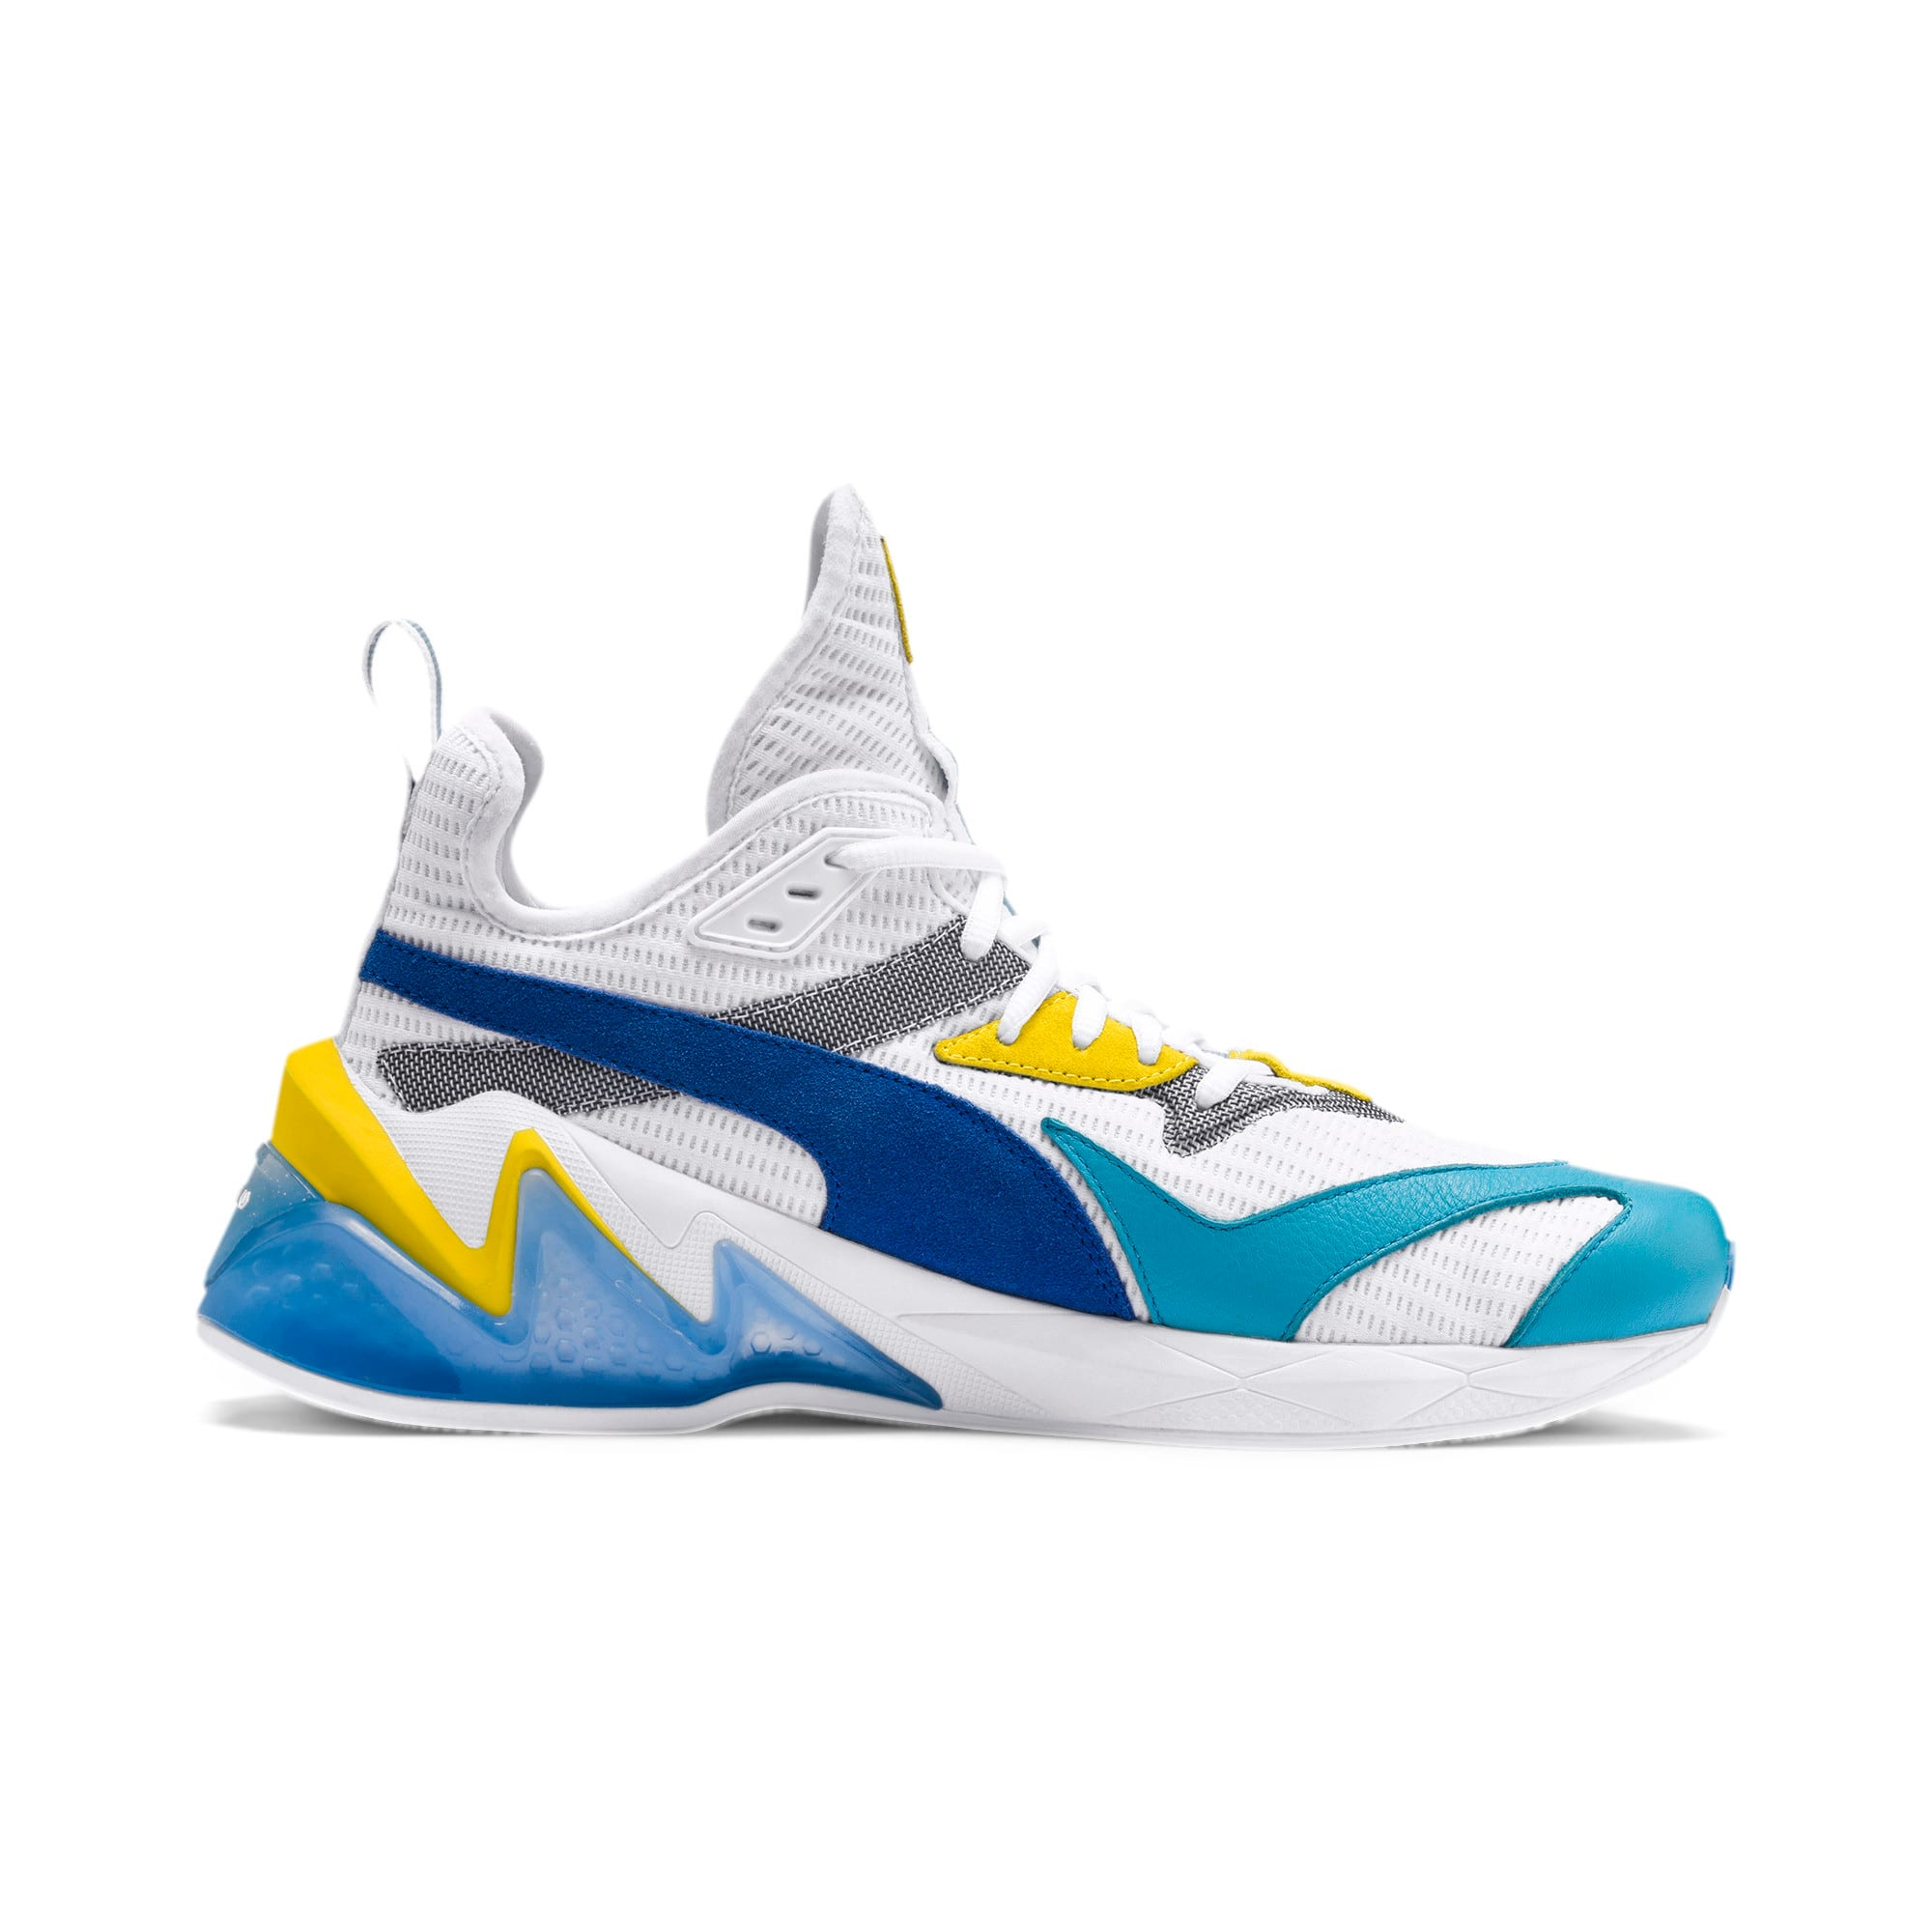 Thumbnail 5 of LQDCELL Origin Herren Sneaker, Puma White-B Blue-Blz Yellow, medium